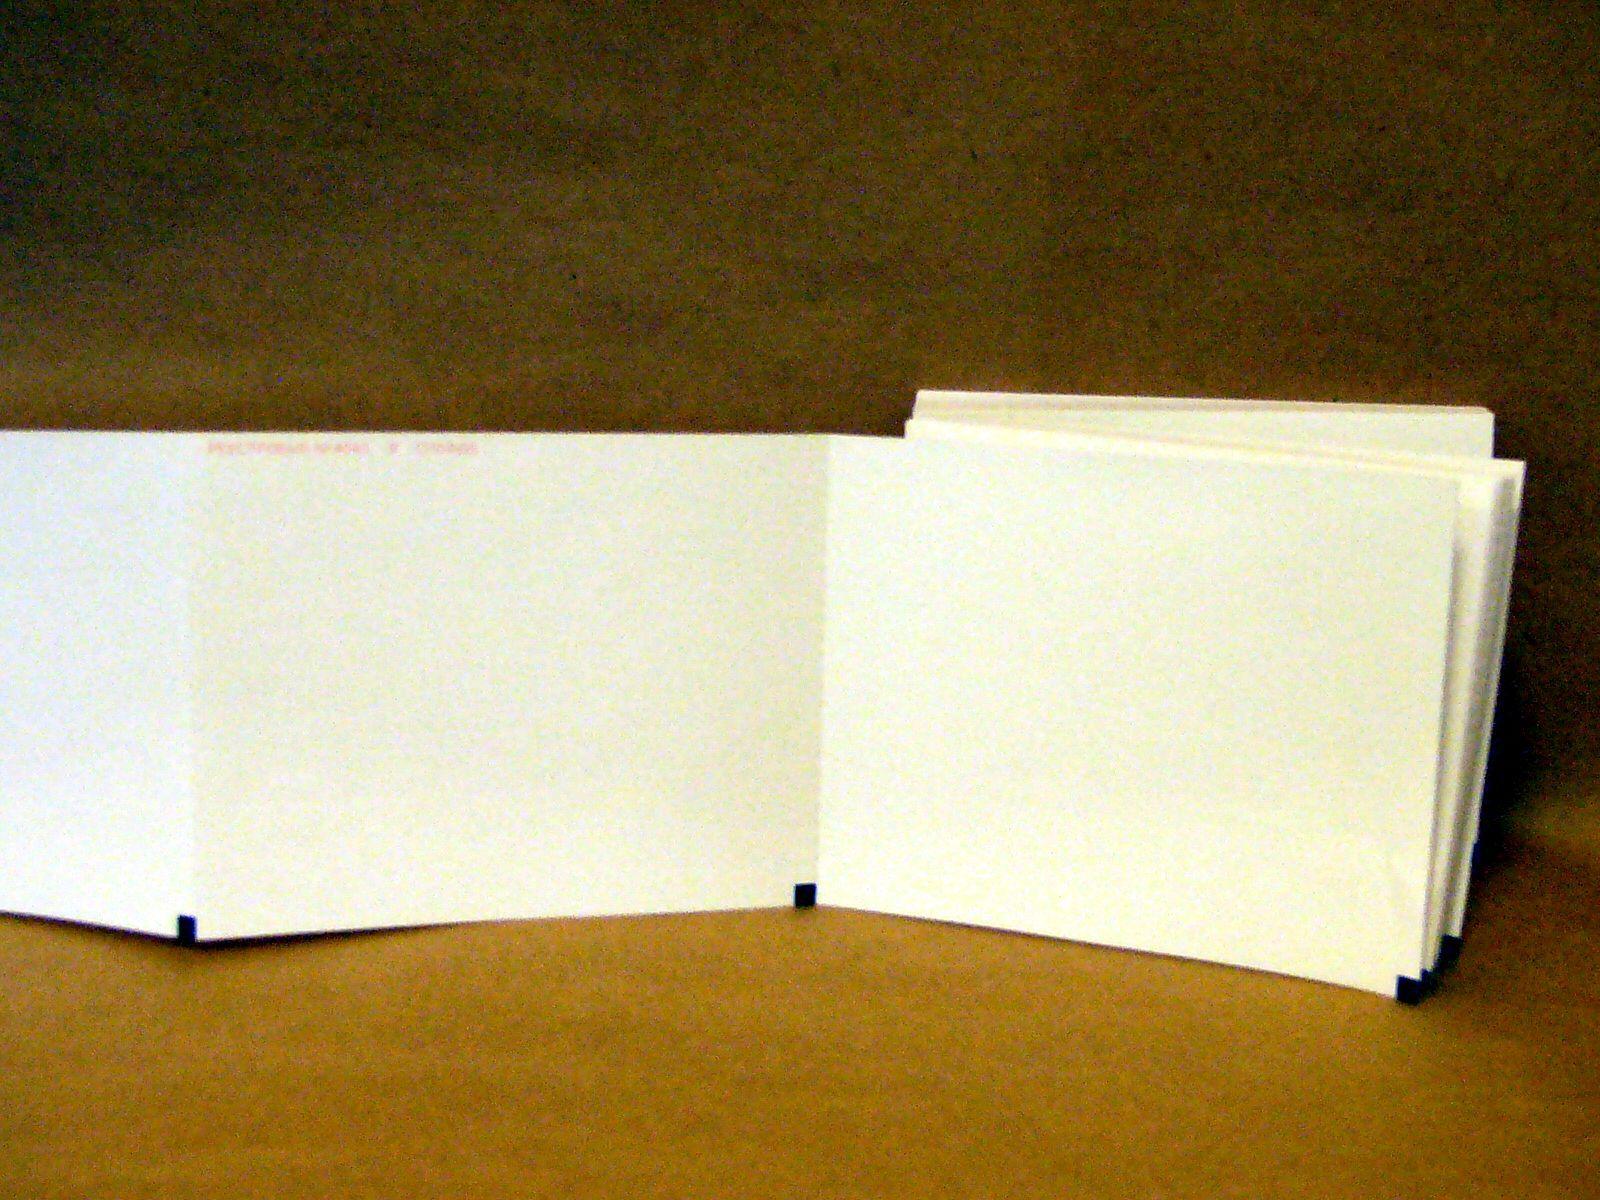 210х140х300, бумага ЭКГ для Nihon Kohden, Dixion, реестр 4089